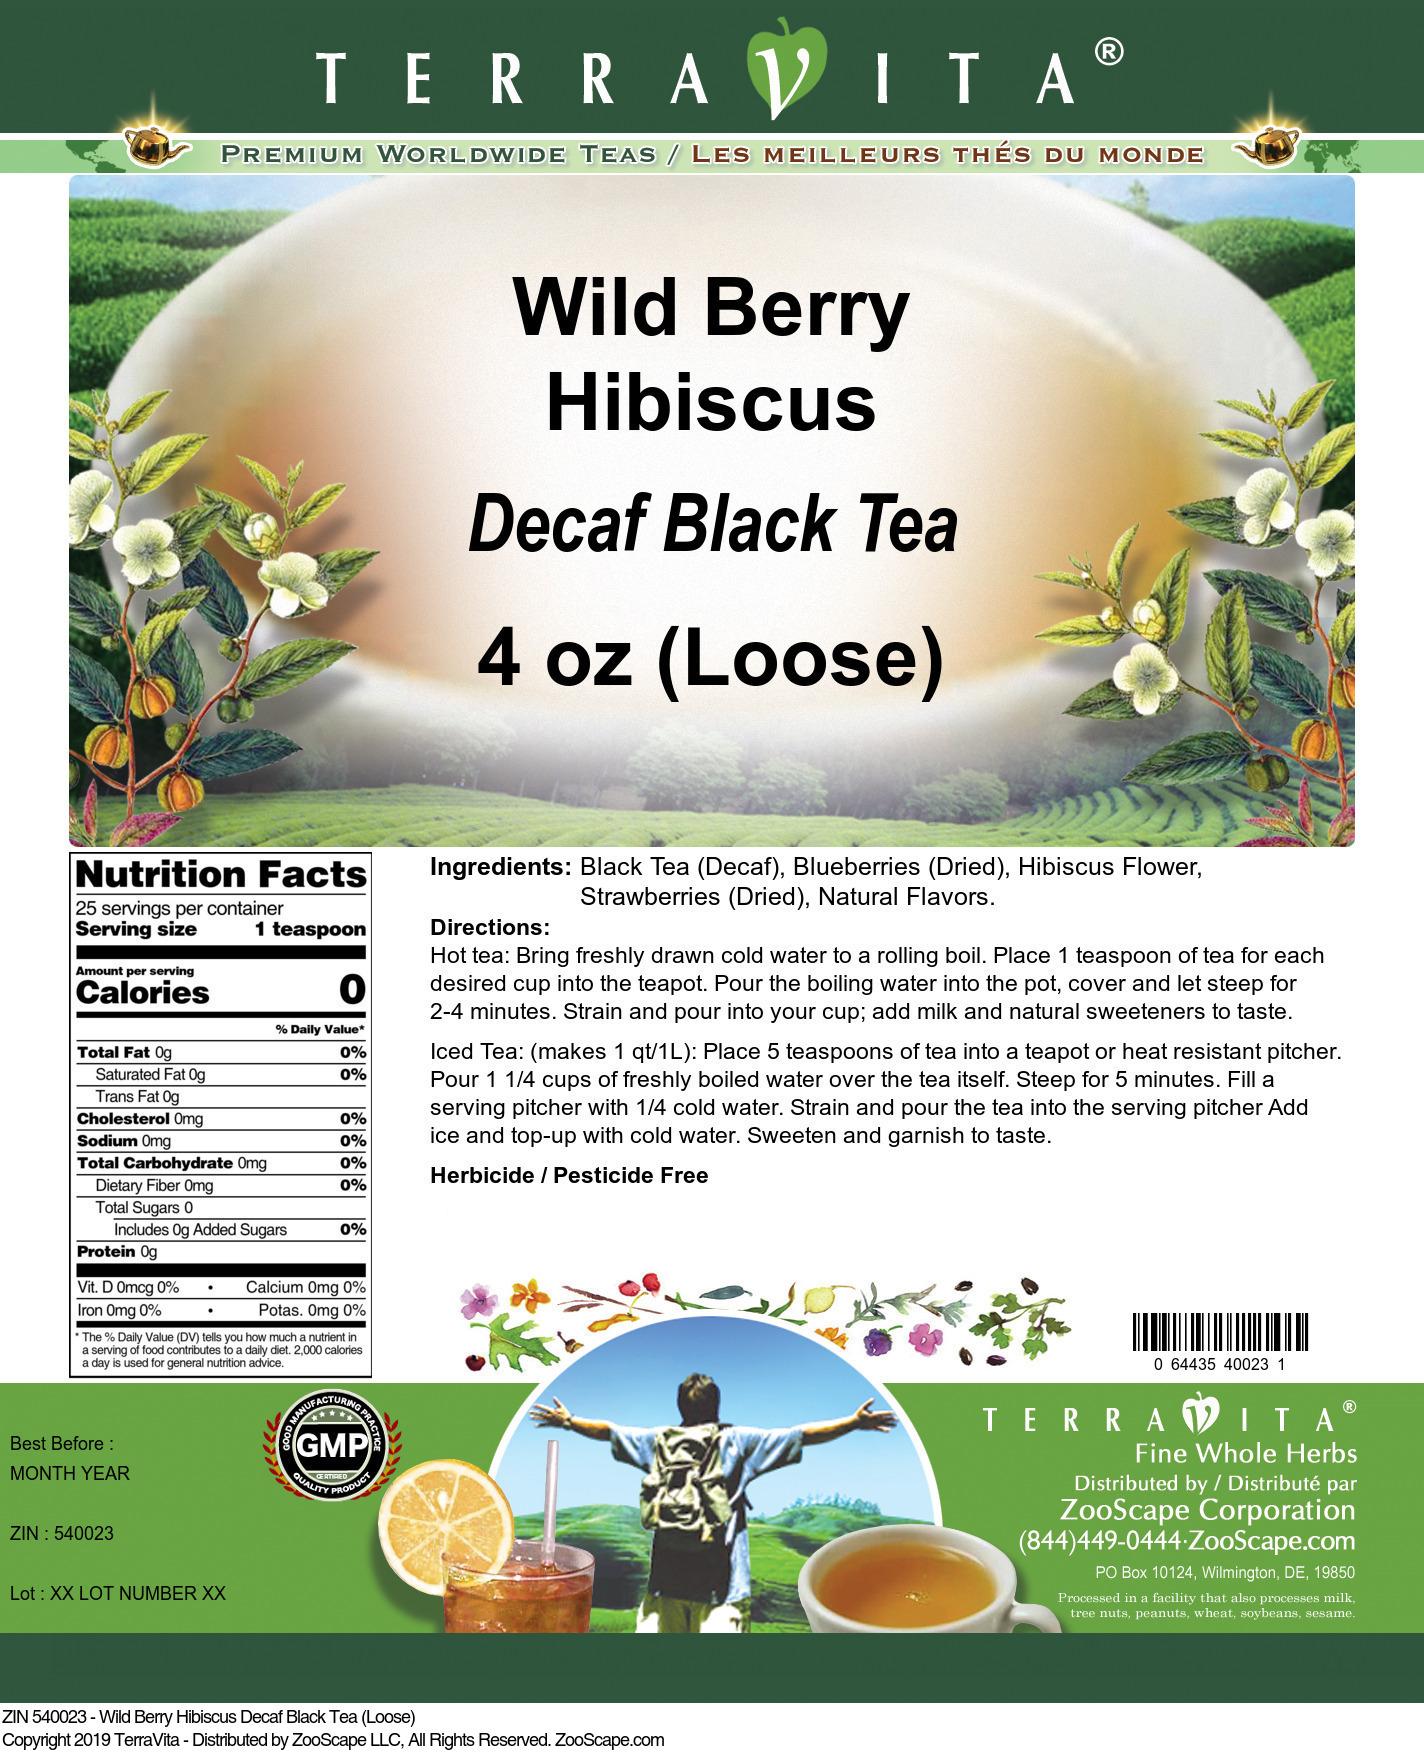 Wild Berry Hibiscus Decaf Black Tea (Loose)